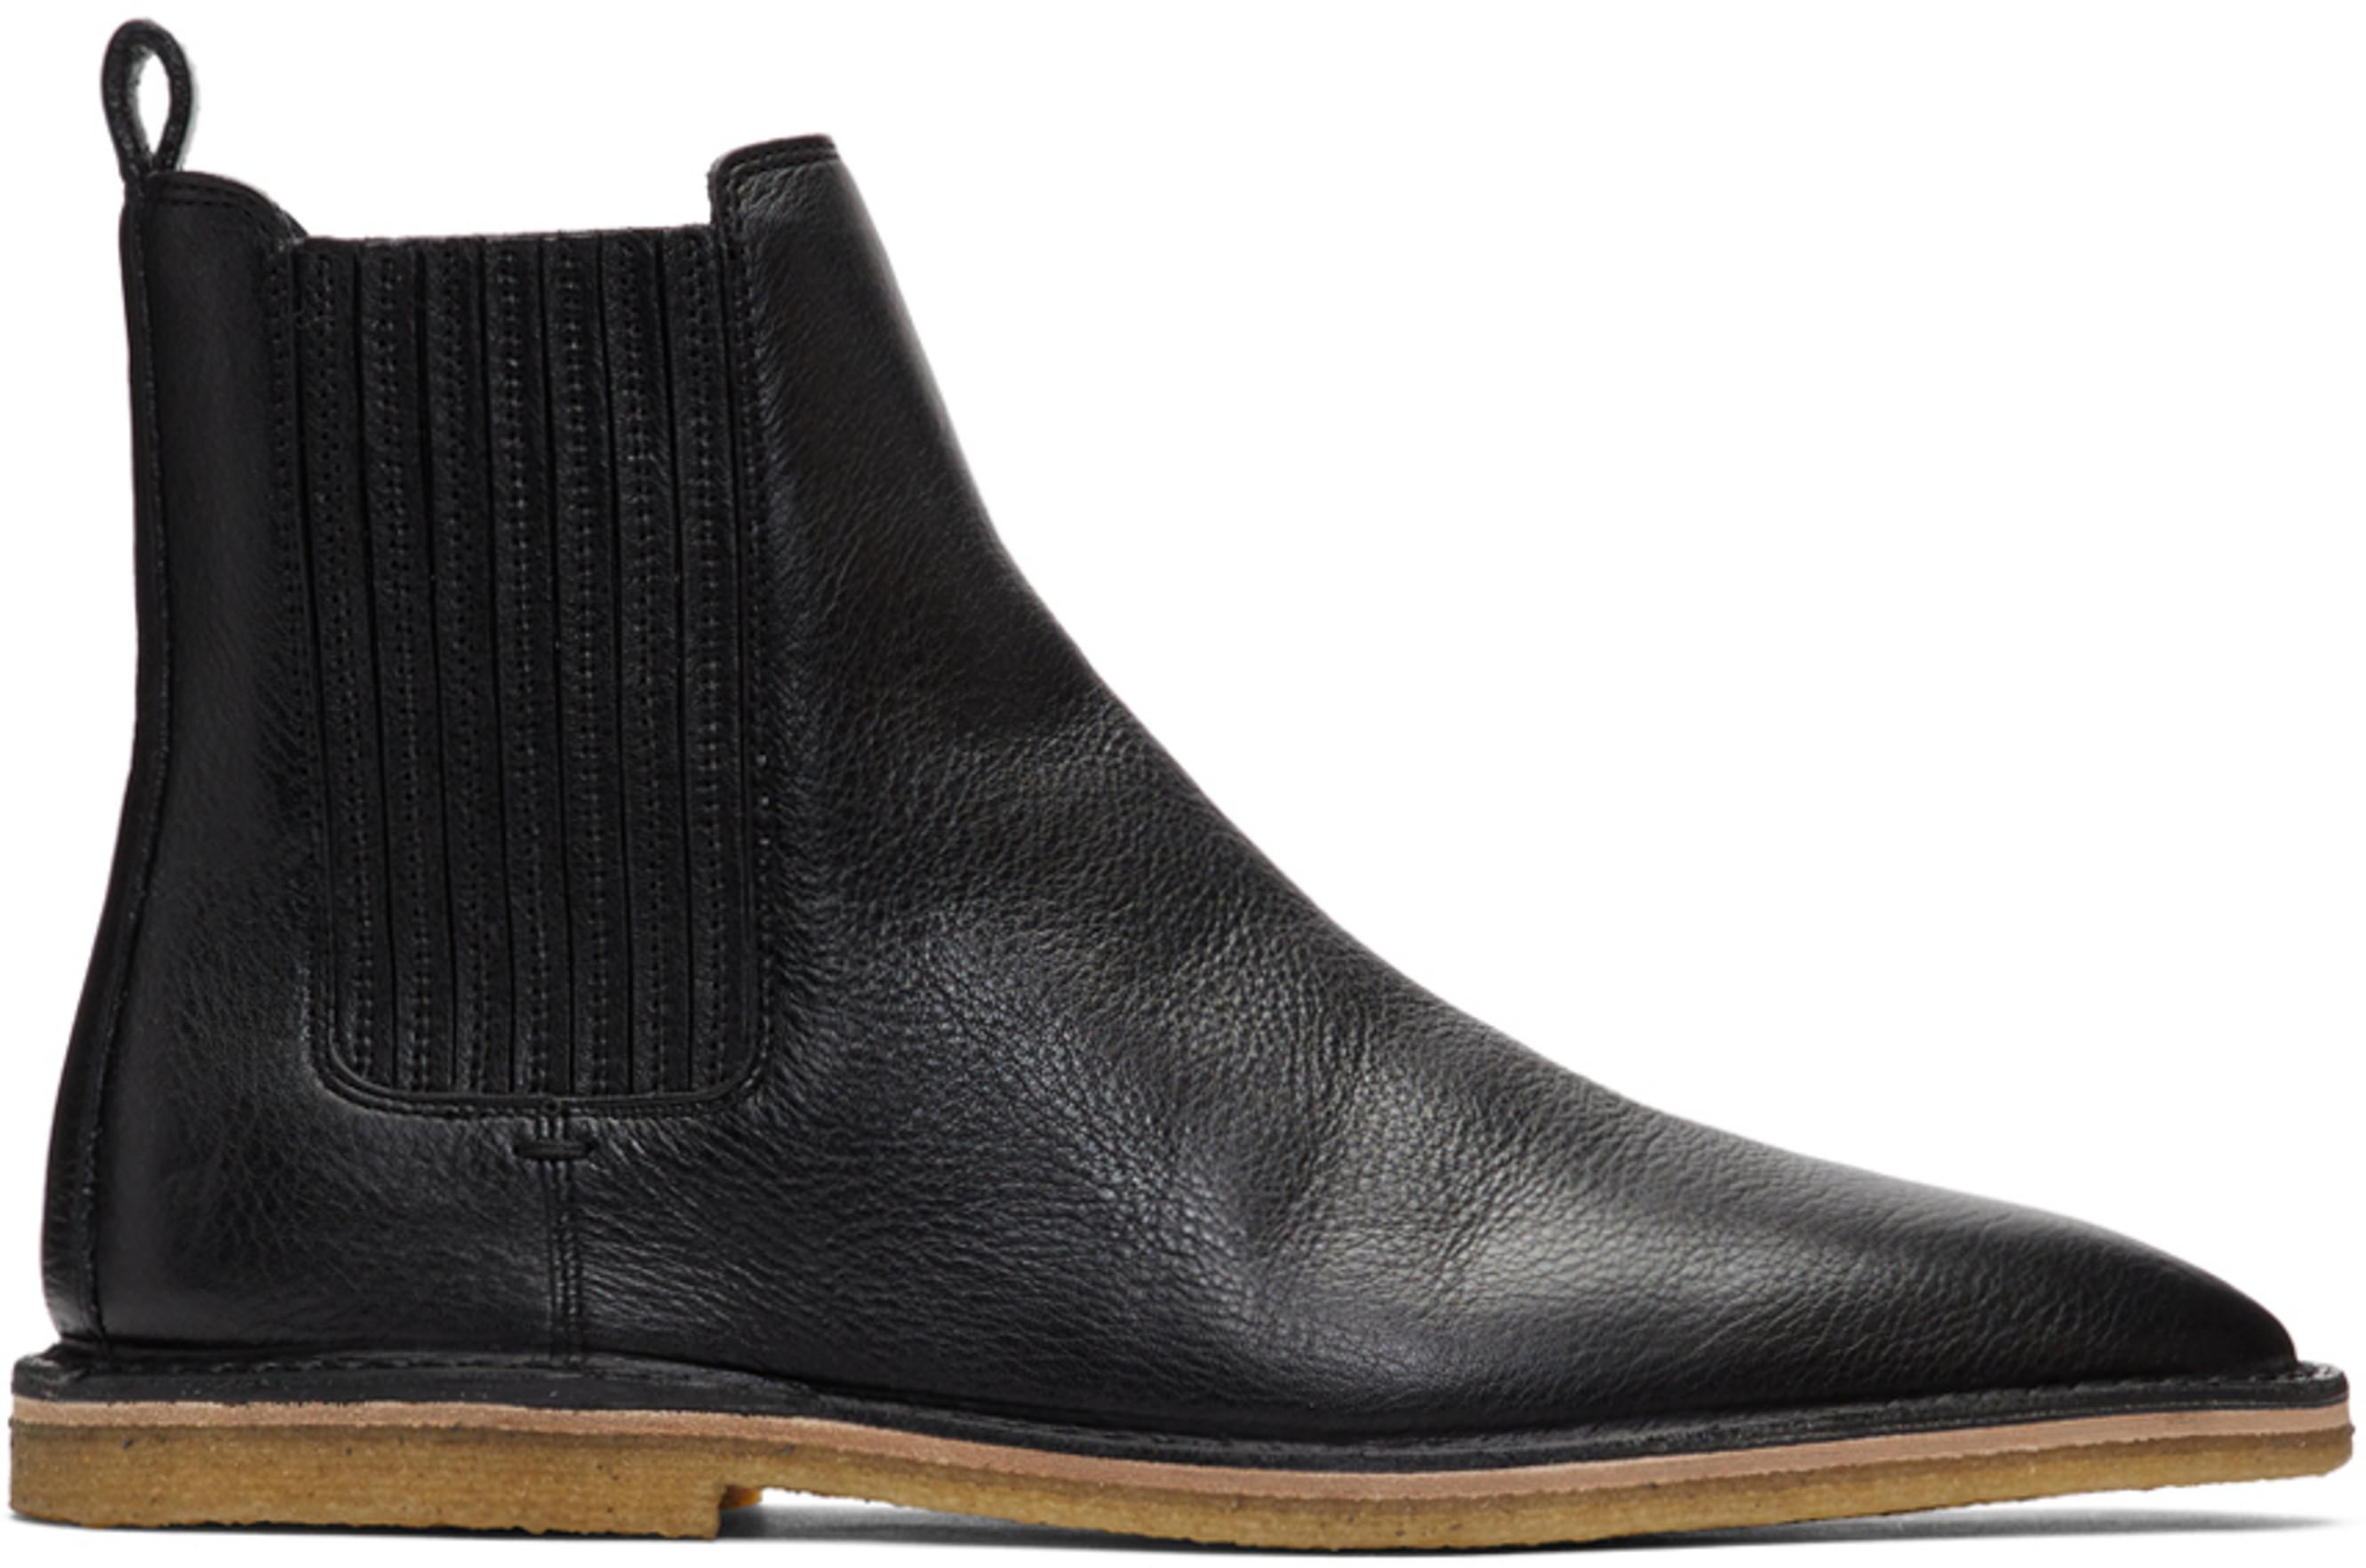 d679319f8f7 Black Nino Chelsea Boots